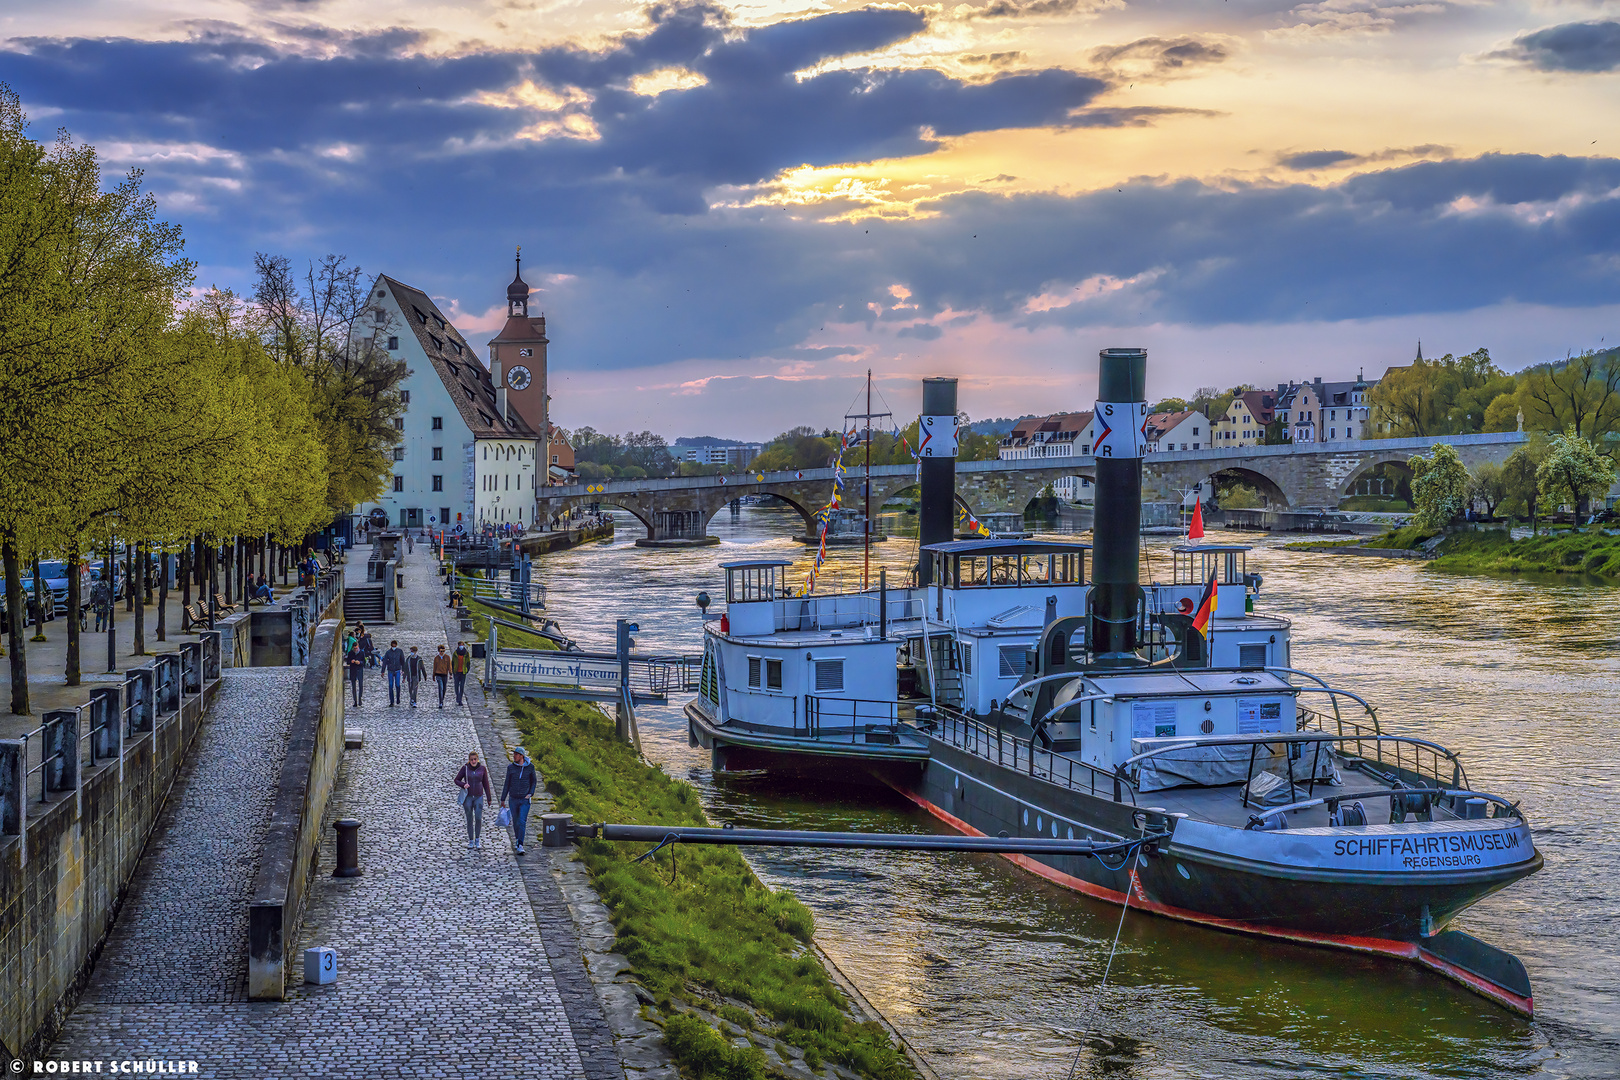 Regensburg: Abendspaziergang an der Donau